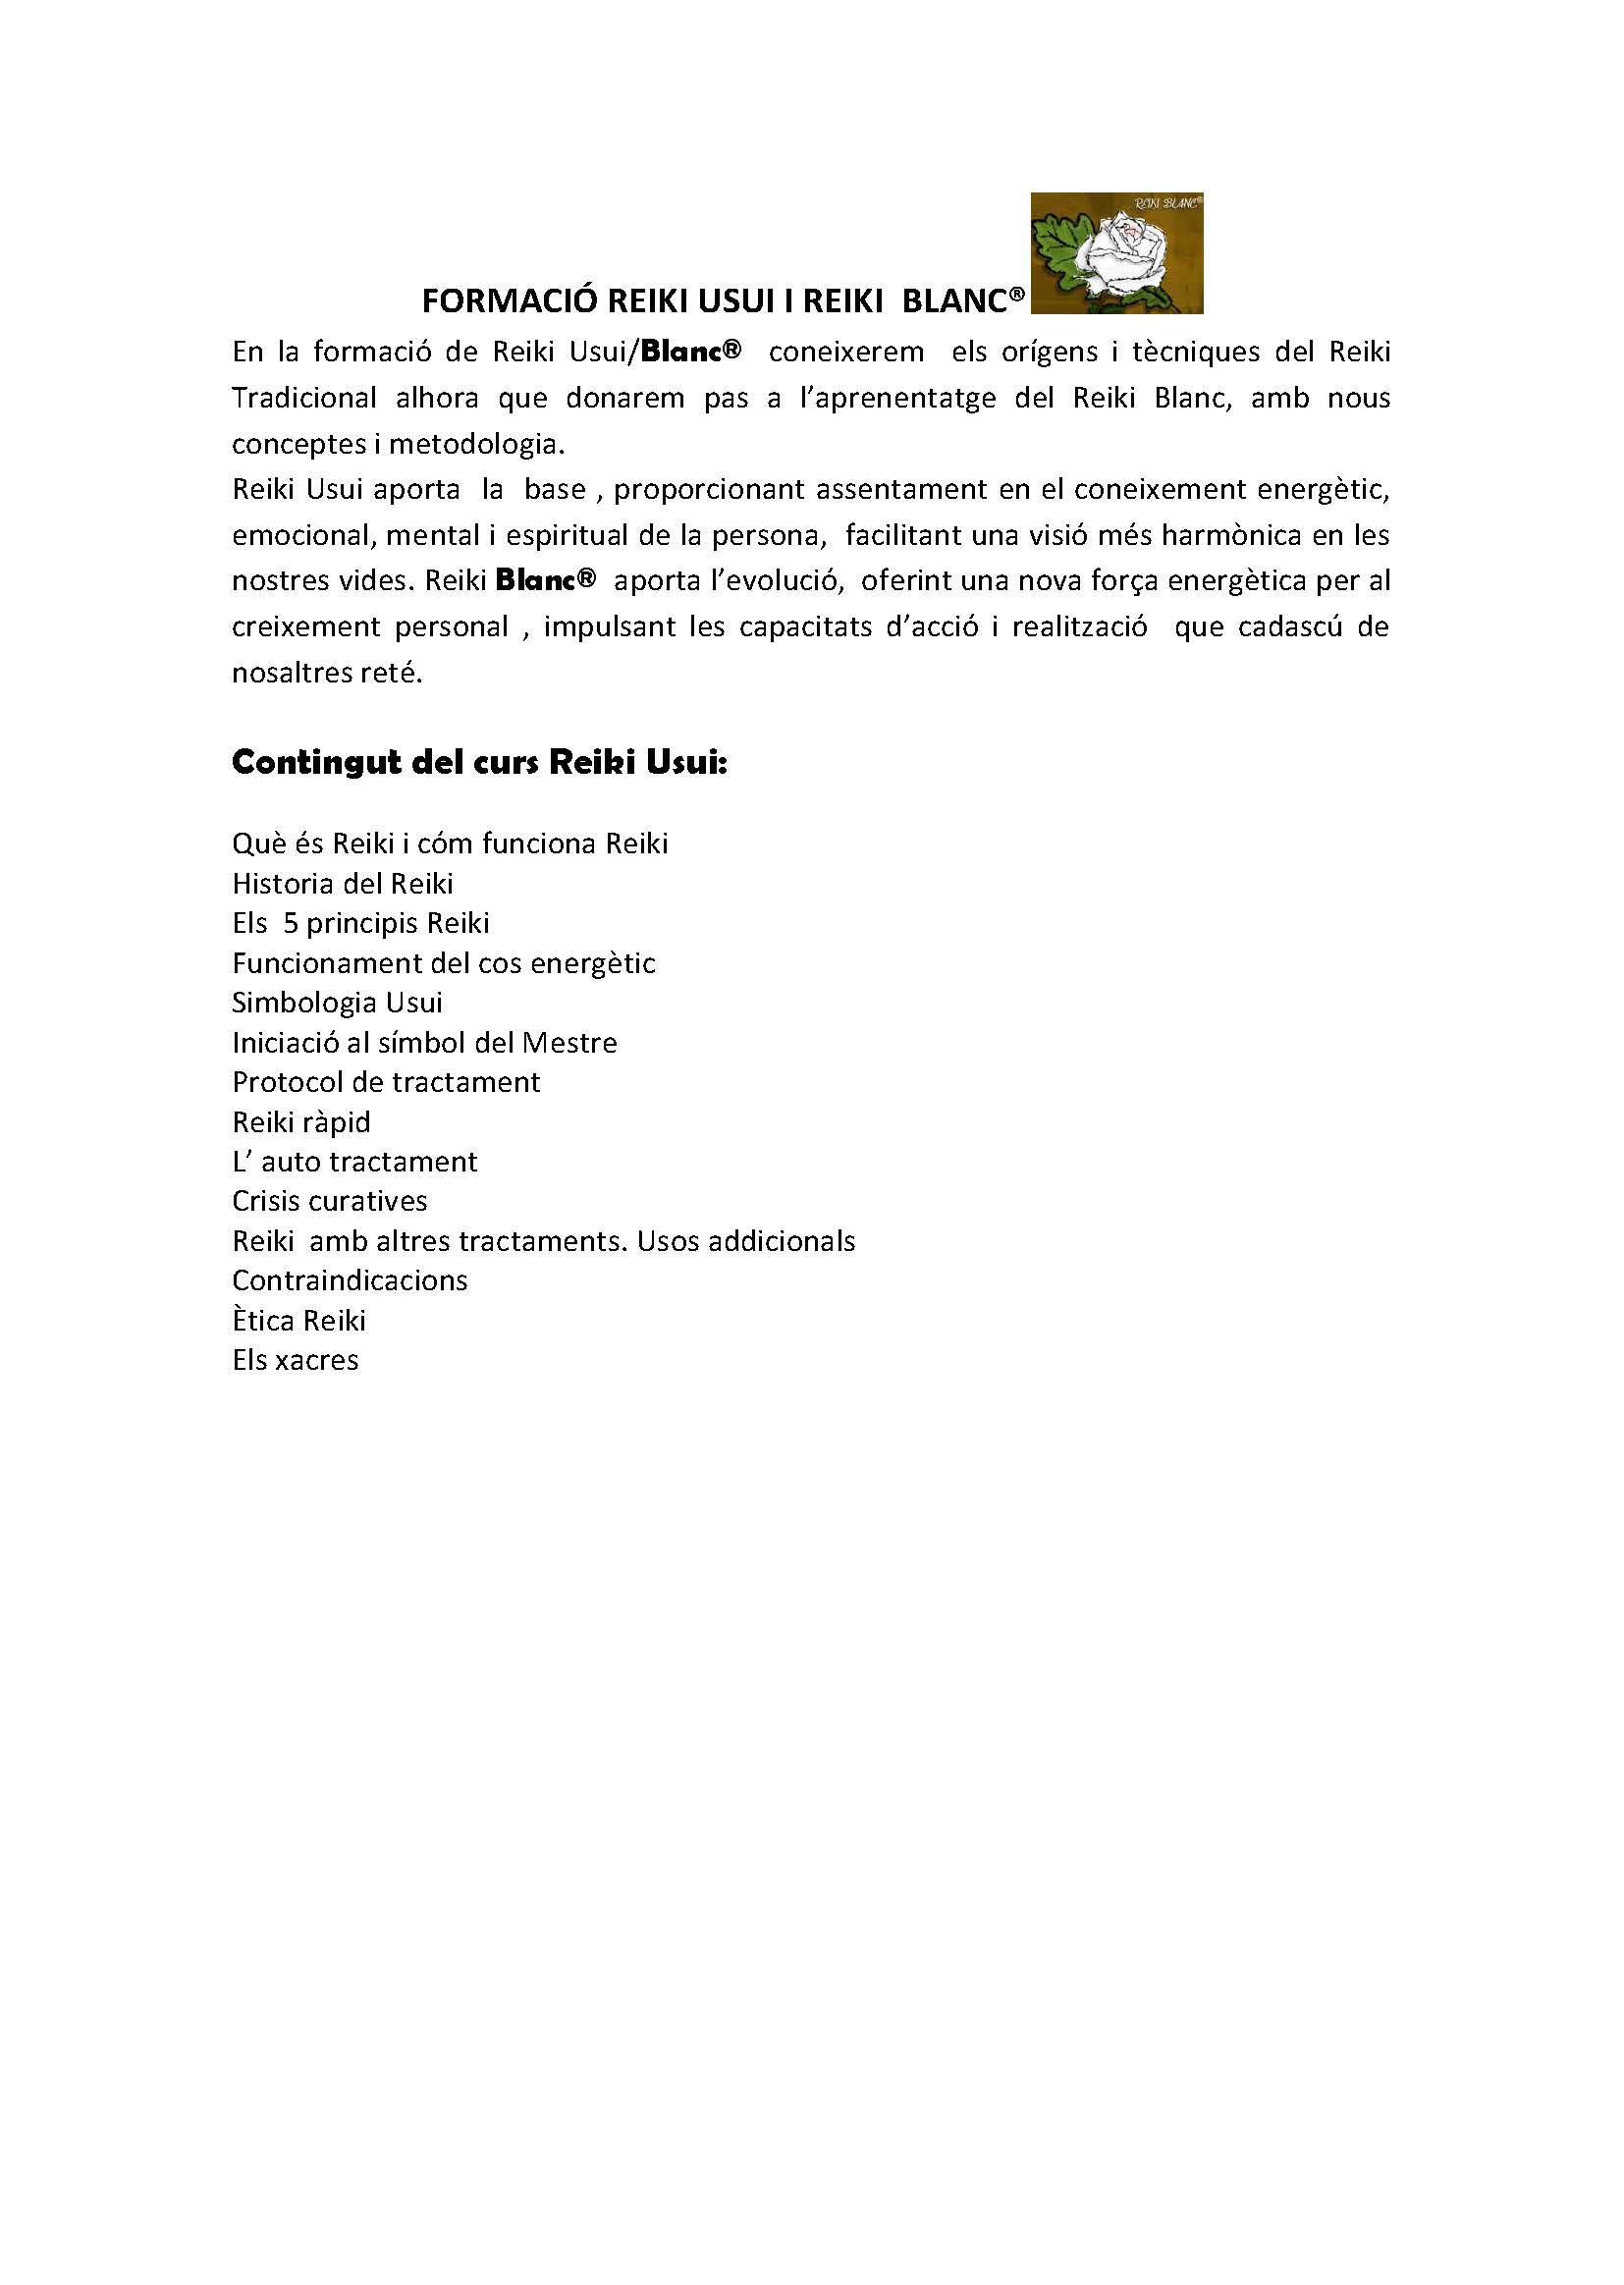 FORMACIÓ REIKI USUI BLANC 9 mesos.sense preu_Page_1